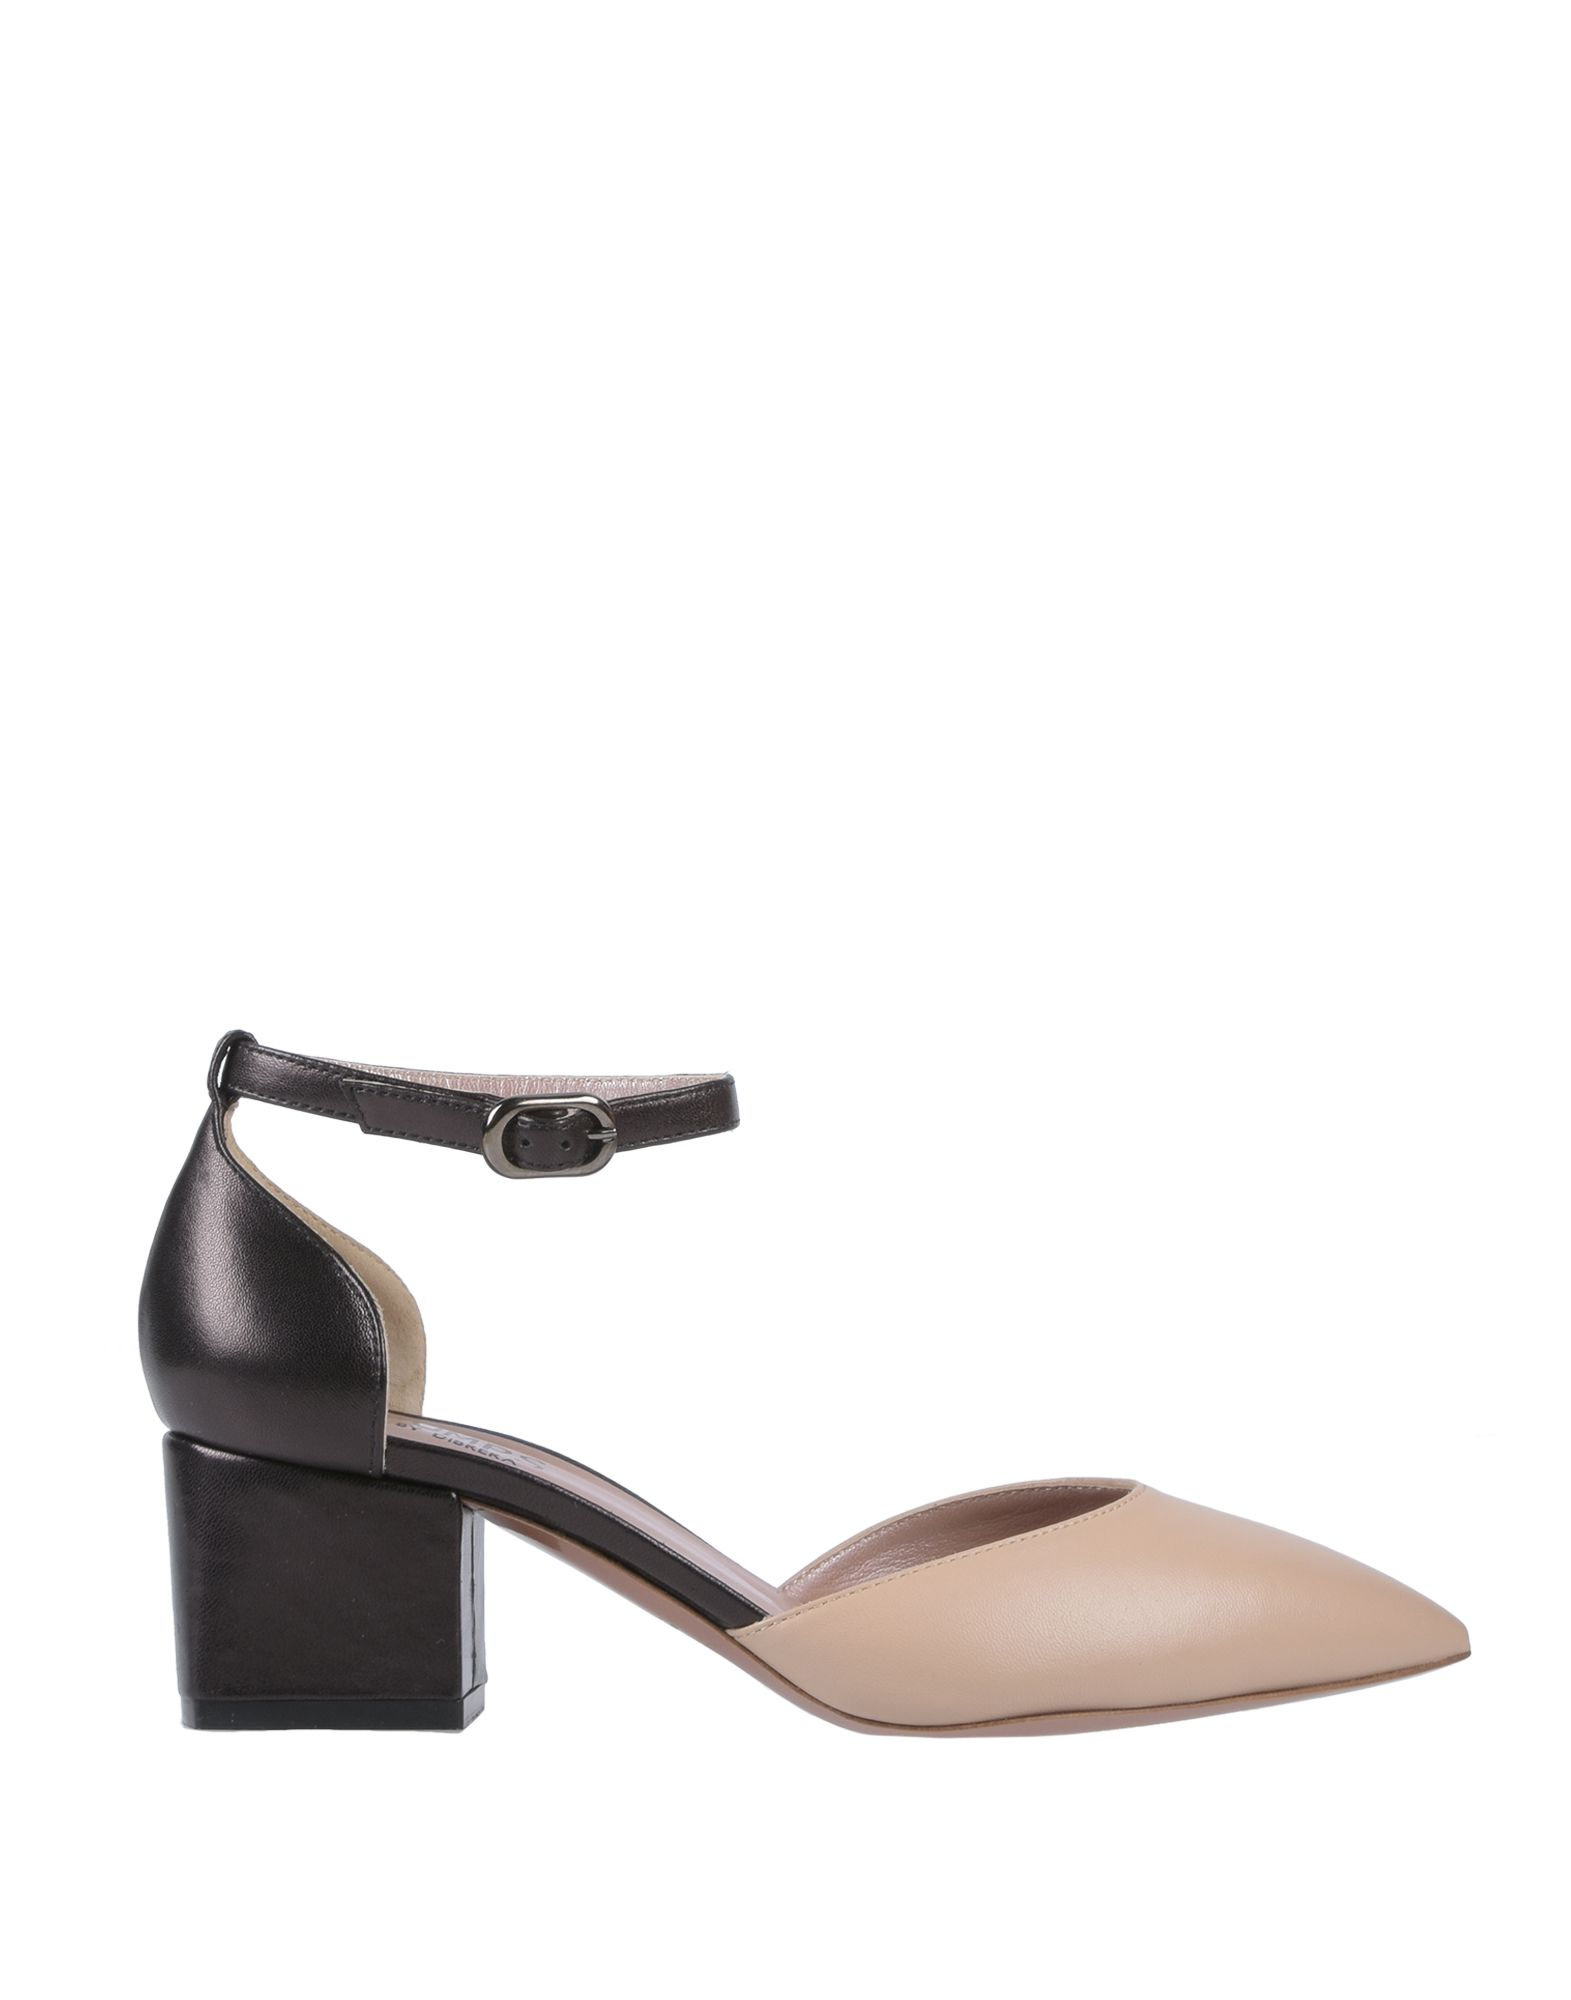 LES PUMPS Туфли цены онлайн